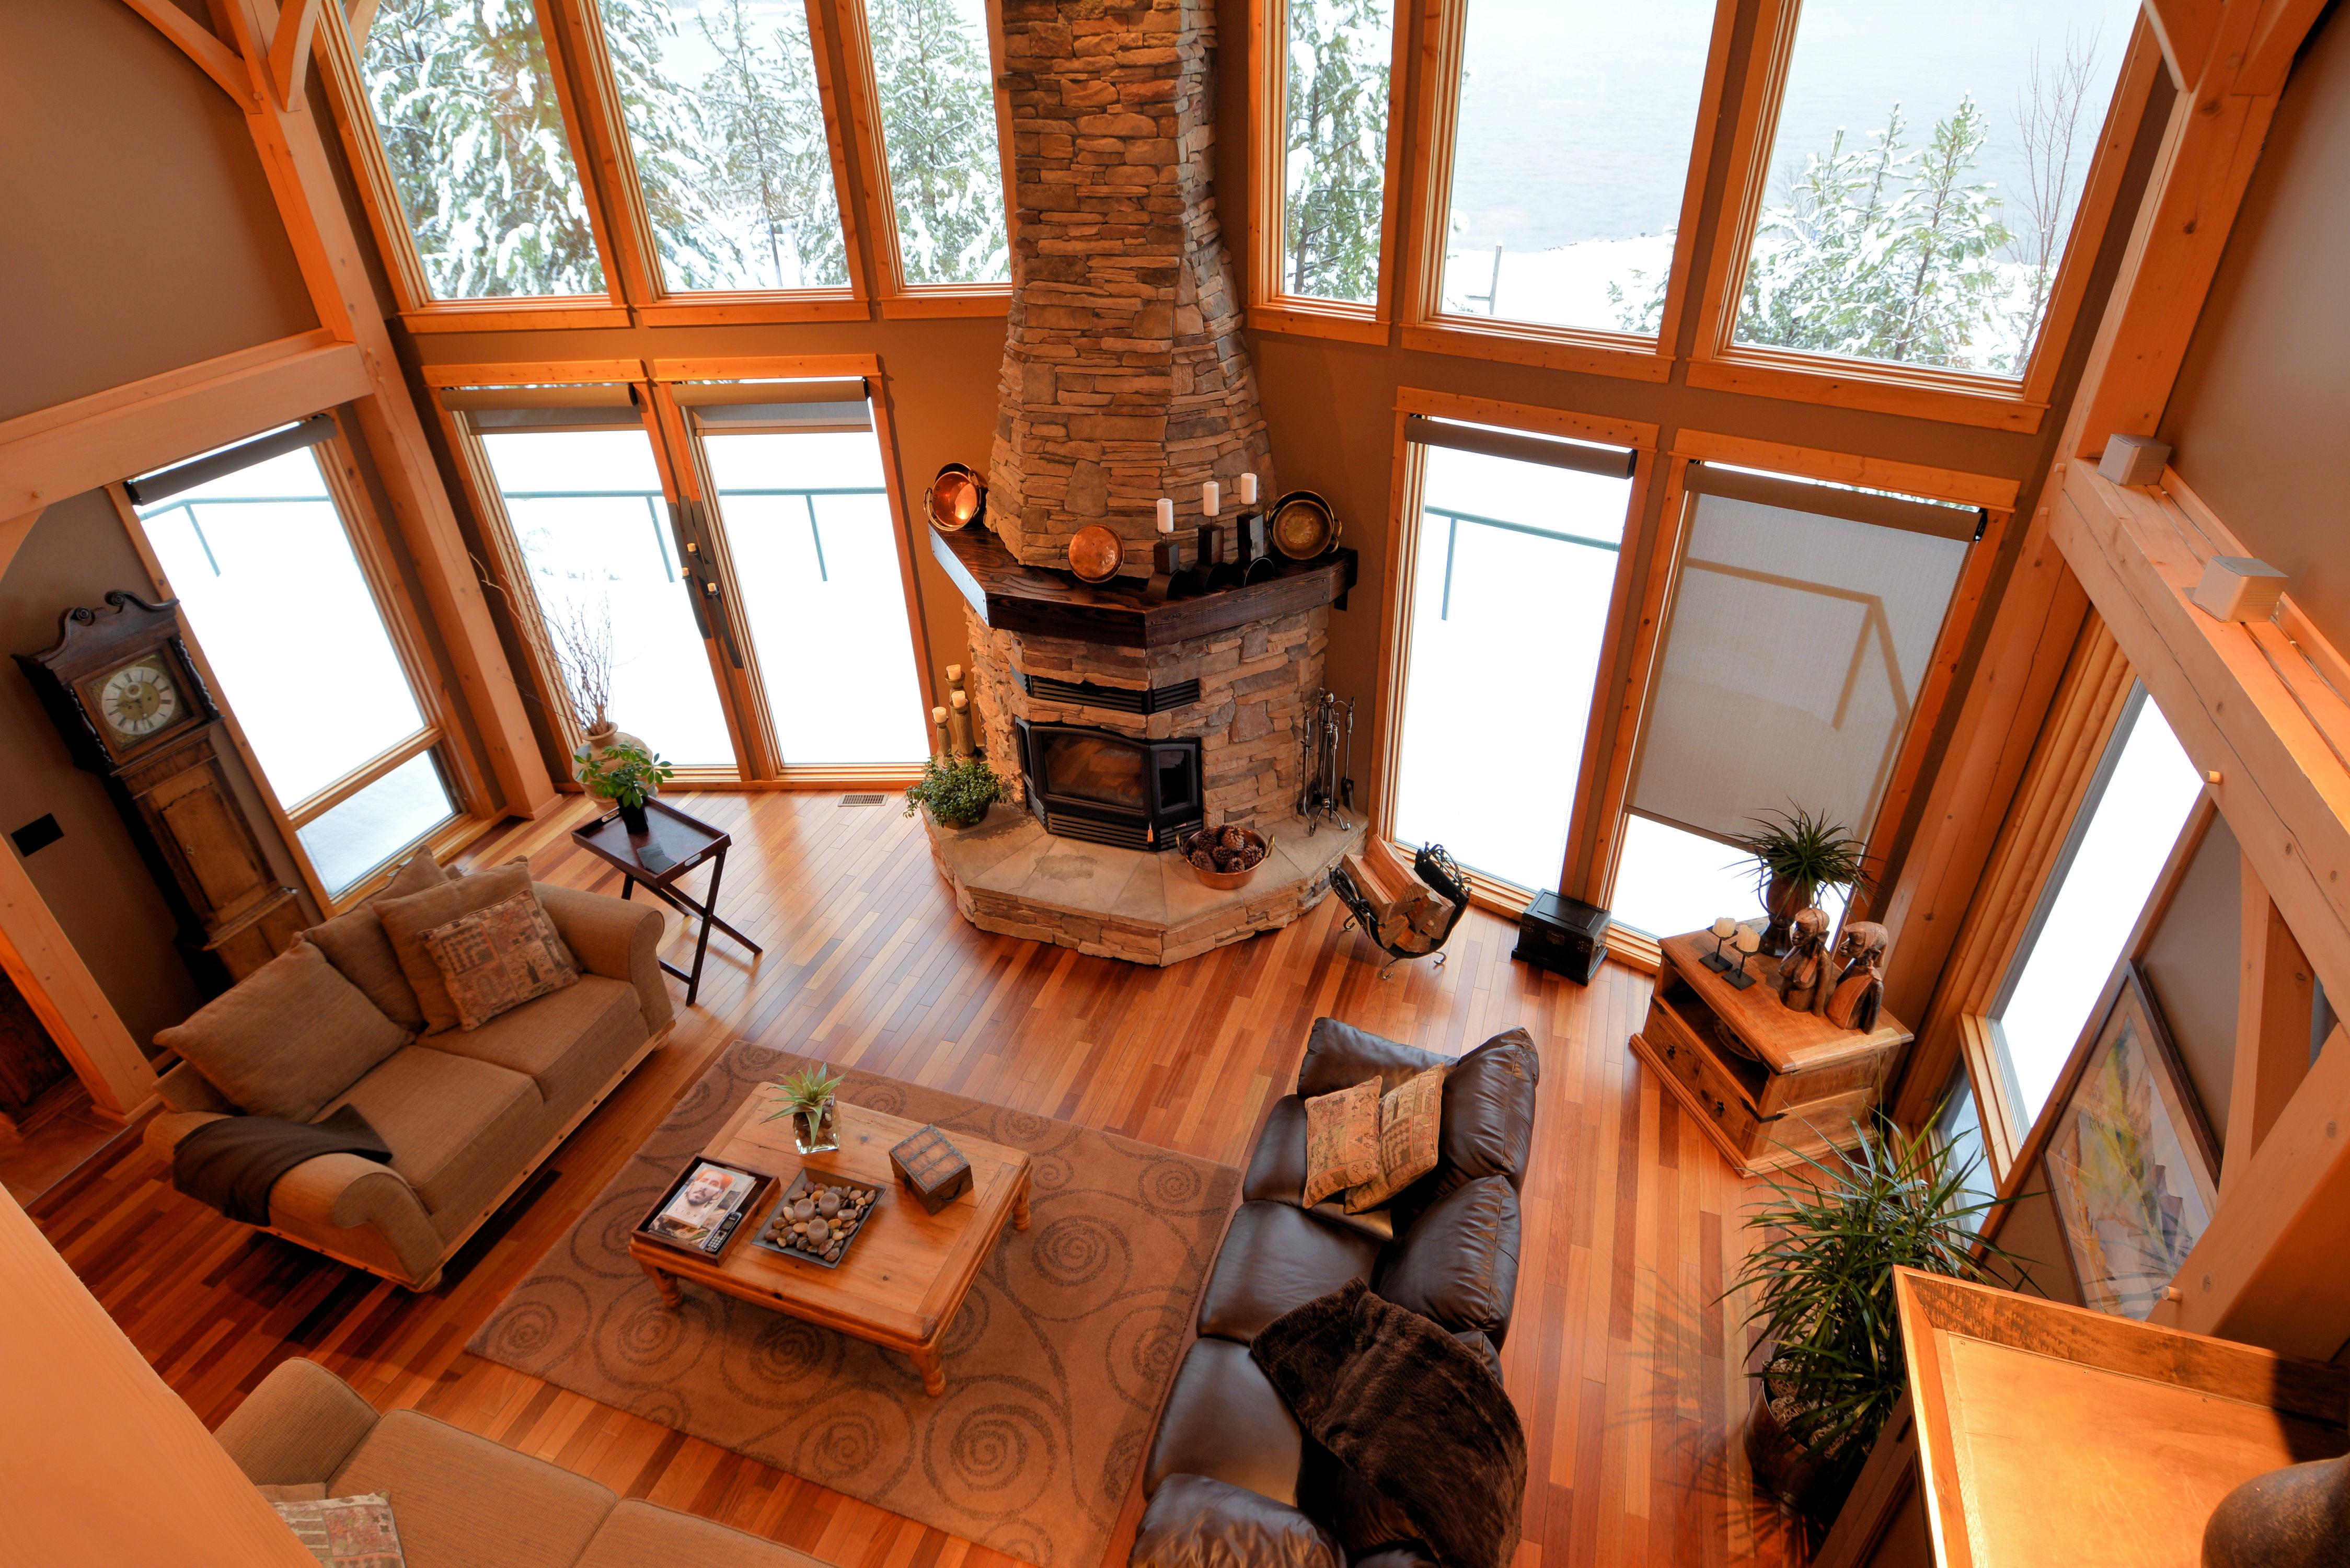 Living Room: 24' x 15'6